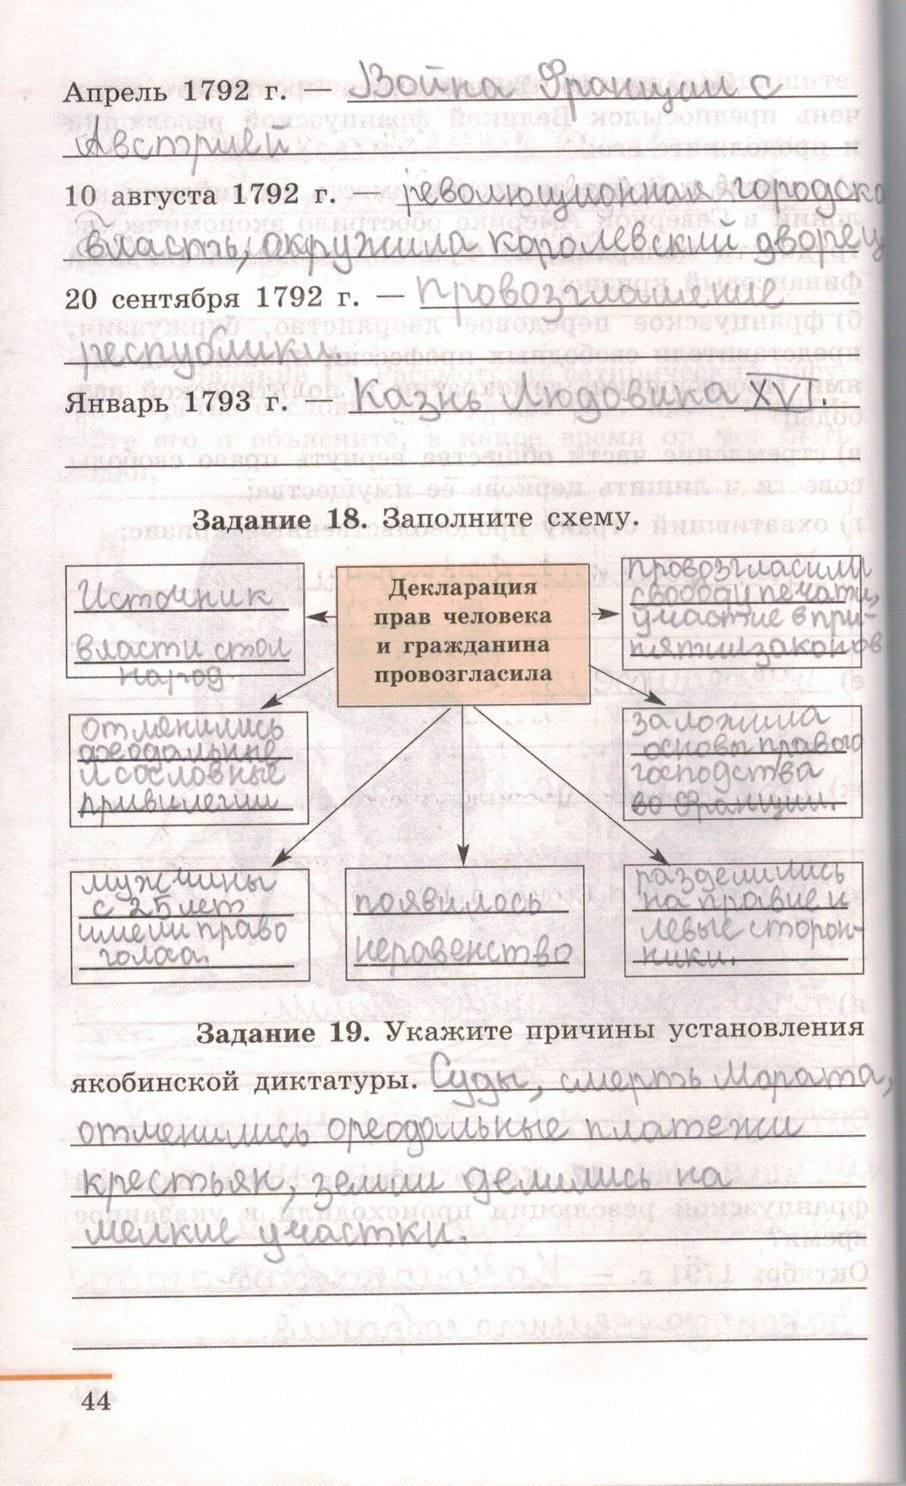 Юдовская класс история решебник онлайн 7 тпо ванюшкина